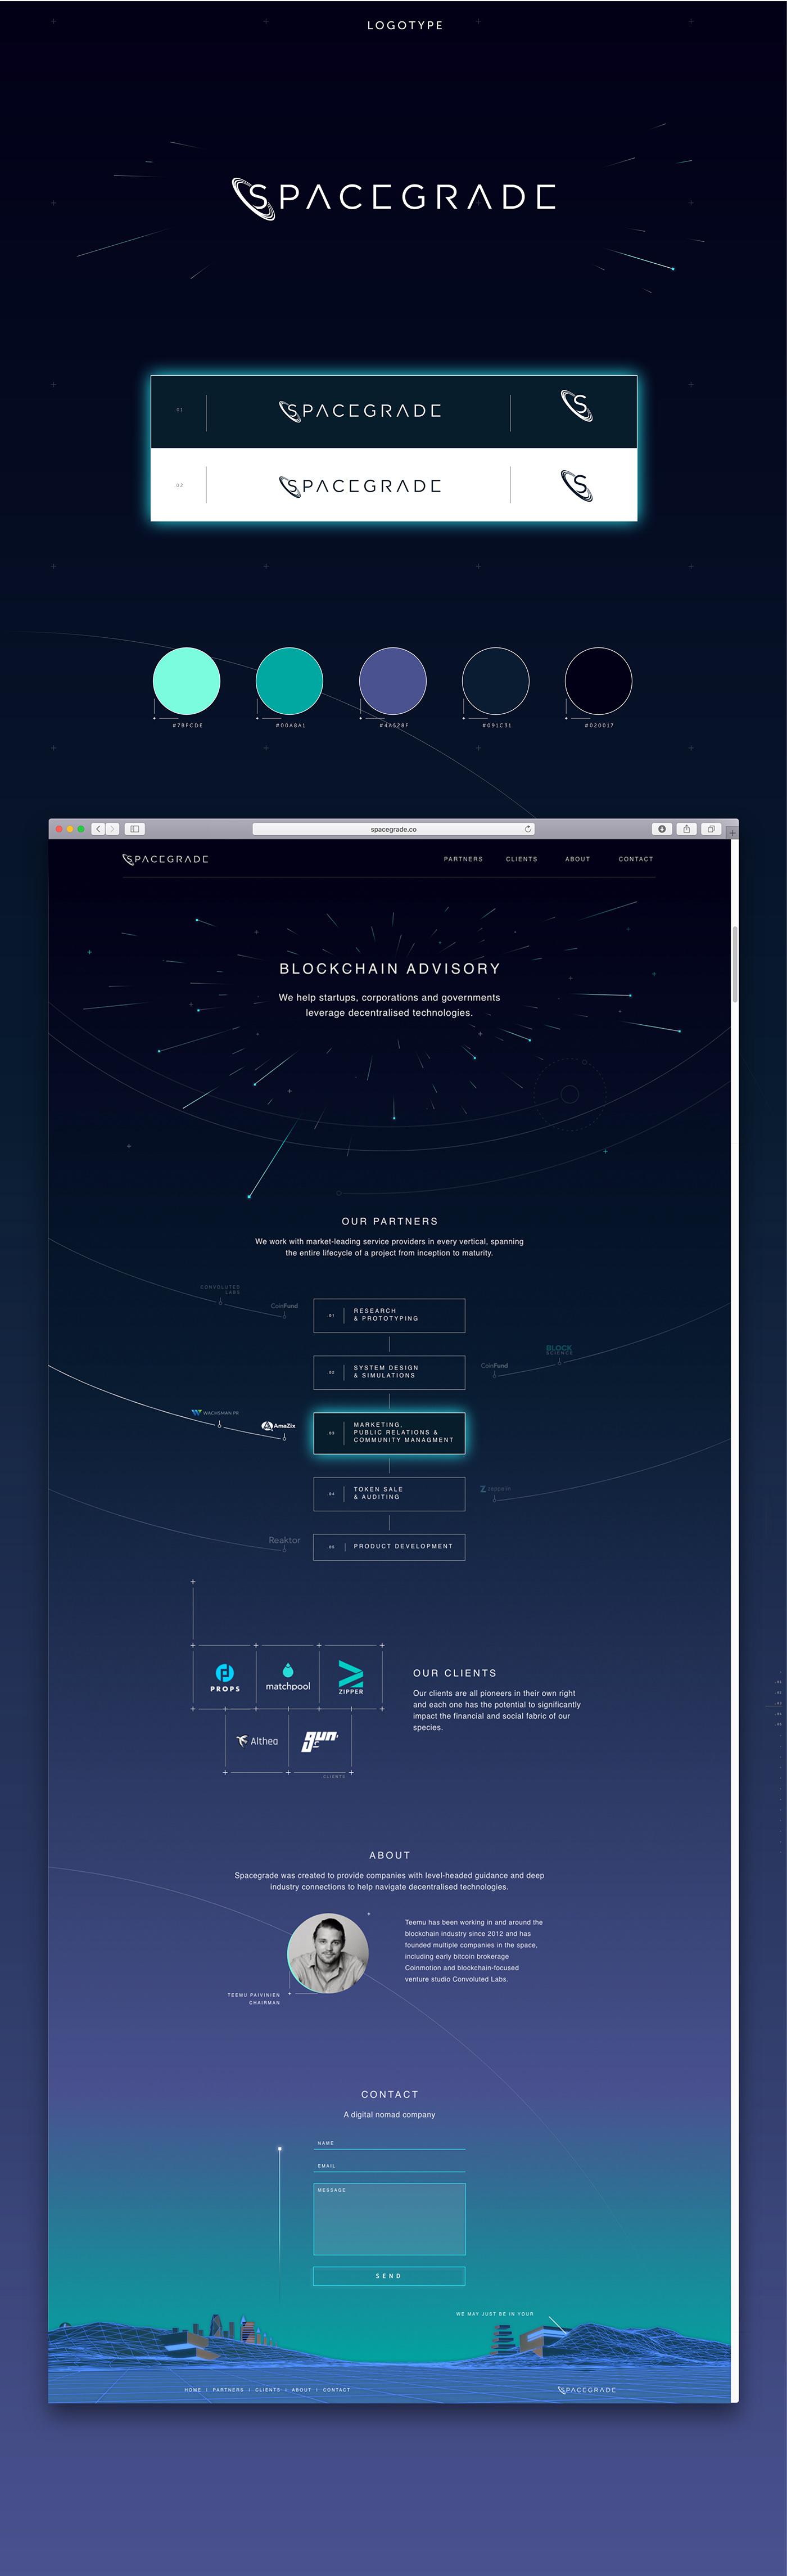 blockchain decentralized advisory bitcoin ethereum crypto Web branding  identity